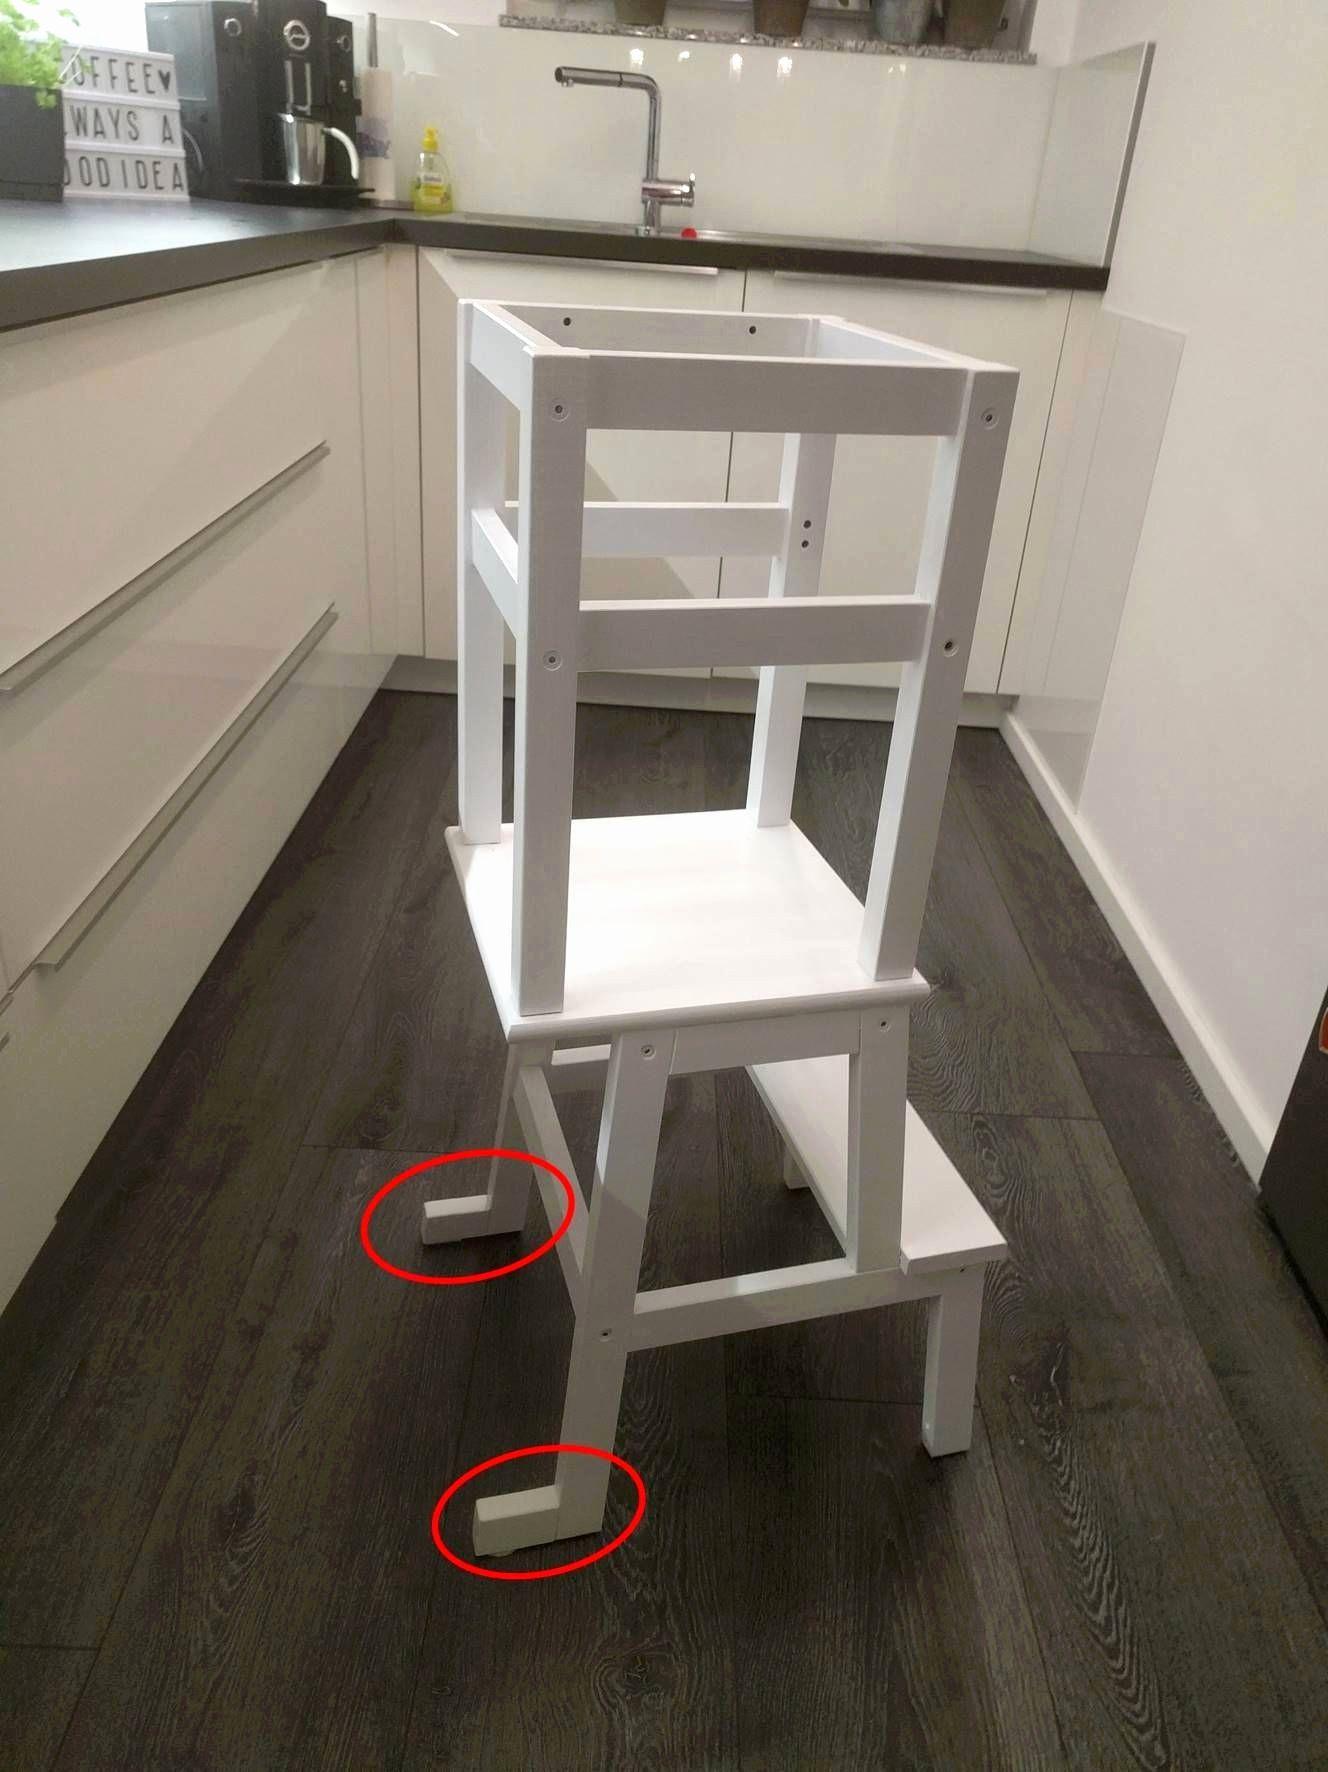 Veranda En Kit Castorama Ikea Hacks Ide Ikea Perabot Buatan Sendiri